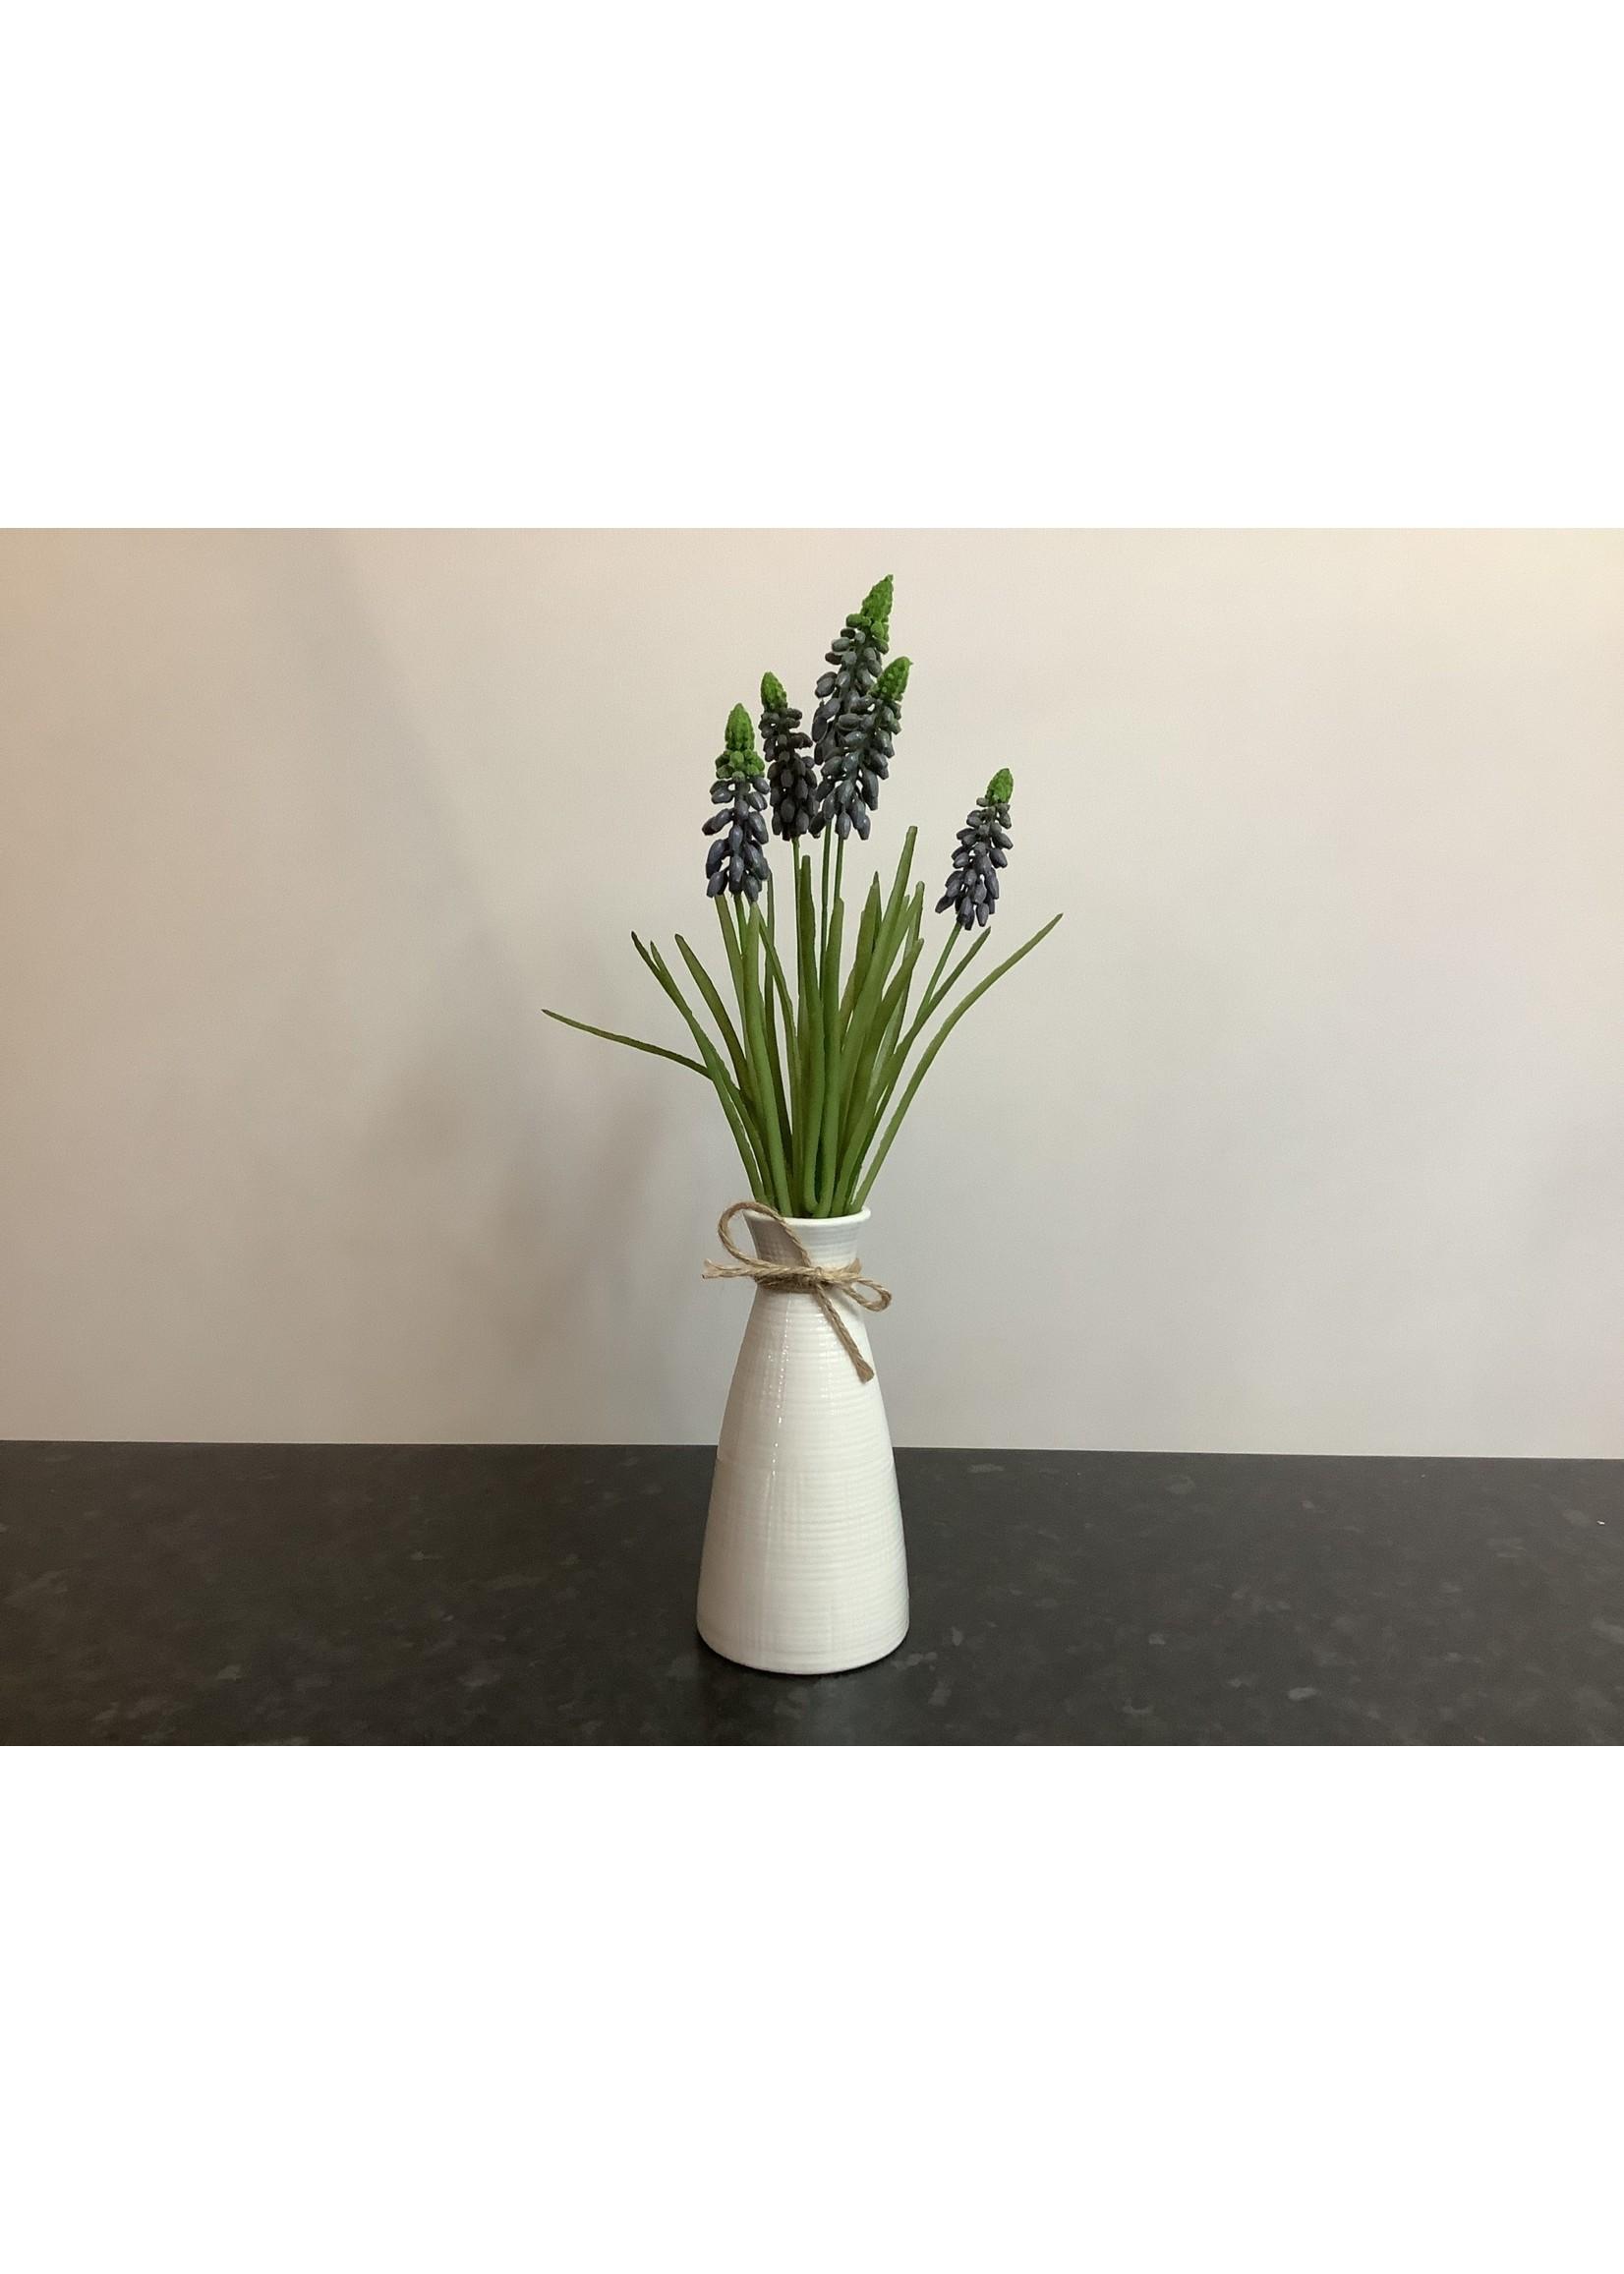 Grape Hyacinth in Ripple Vase 35cm